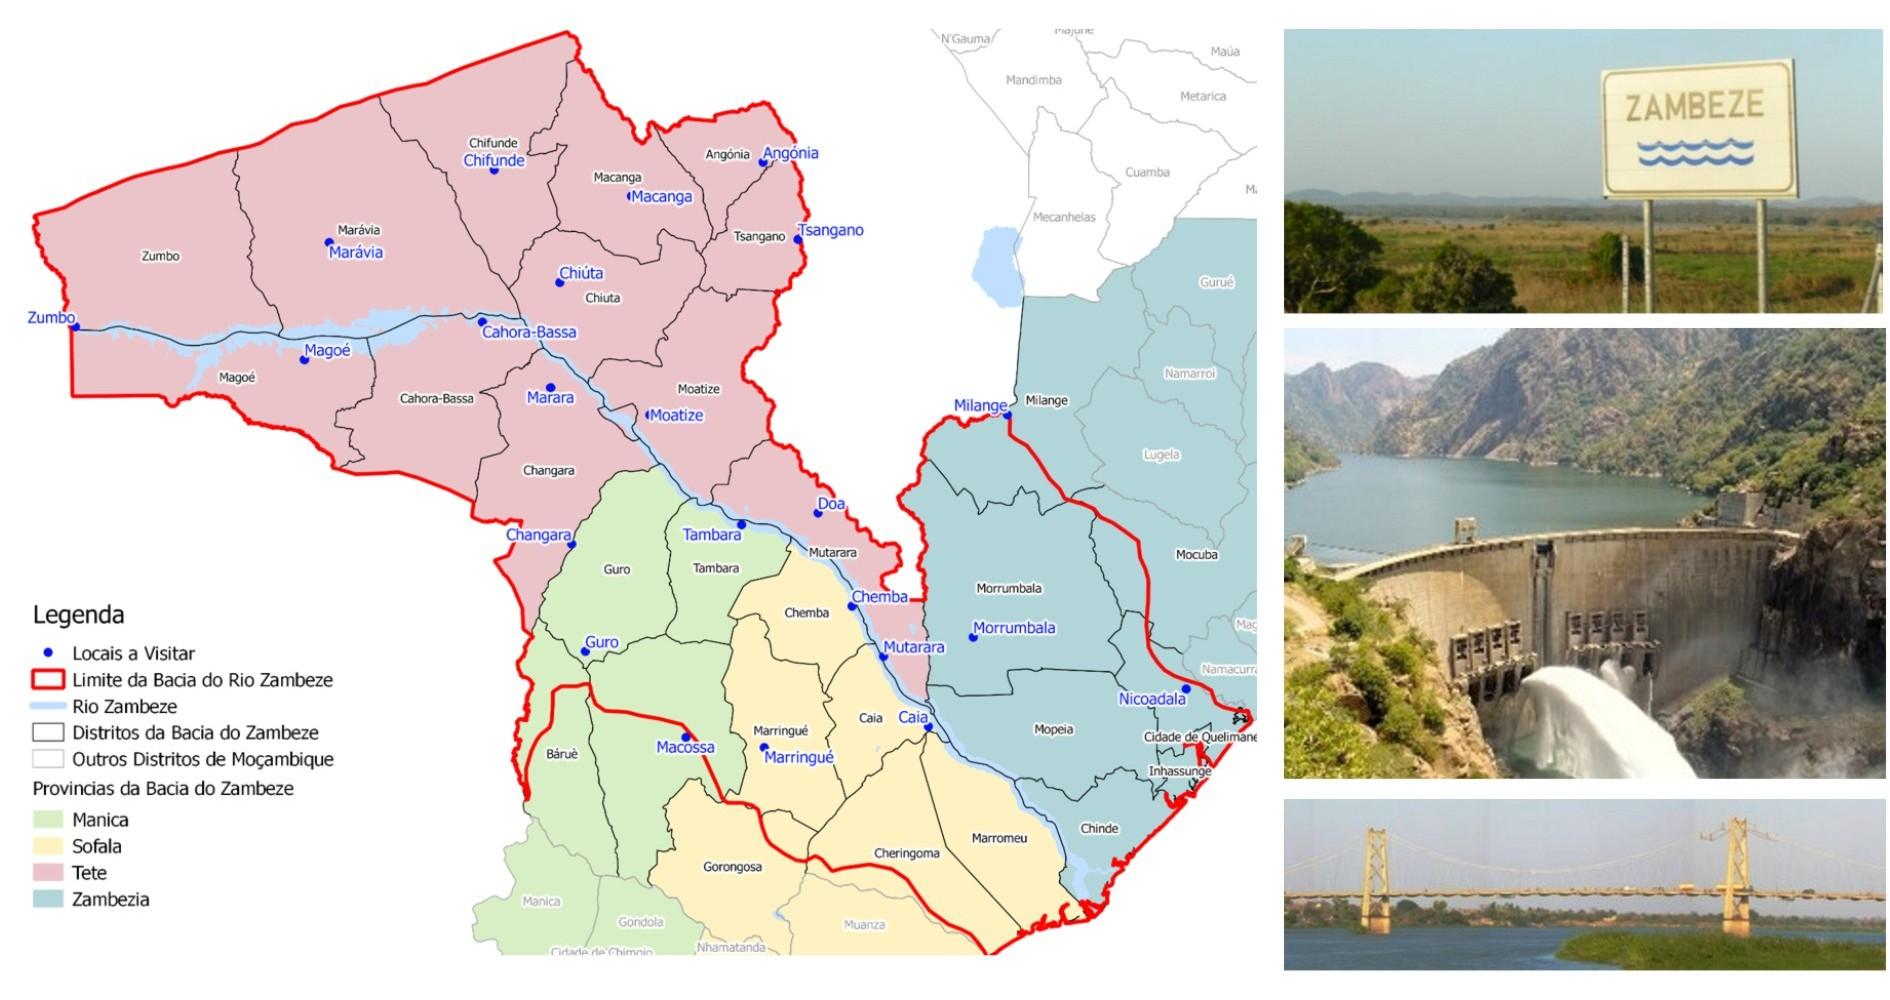 Strategic Plan for the Development of Works for Water Storage in the Zambezi Basin